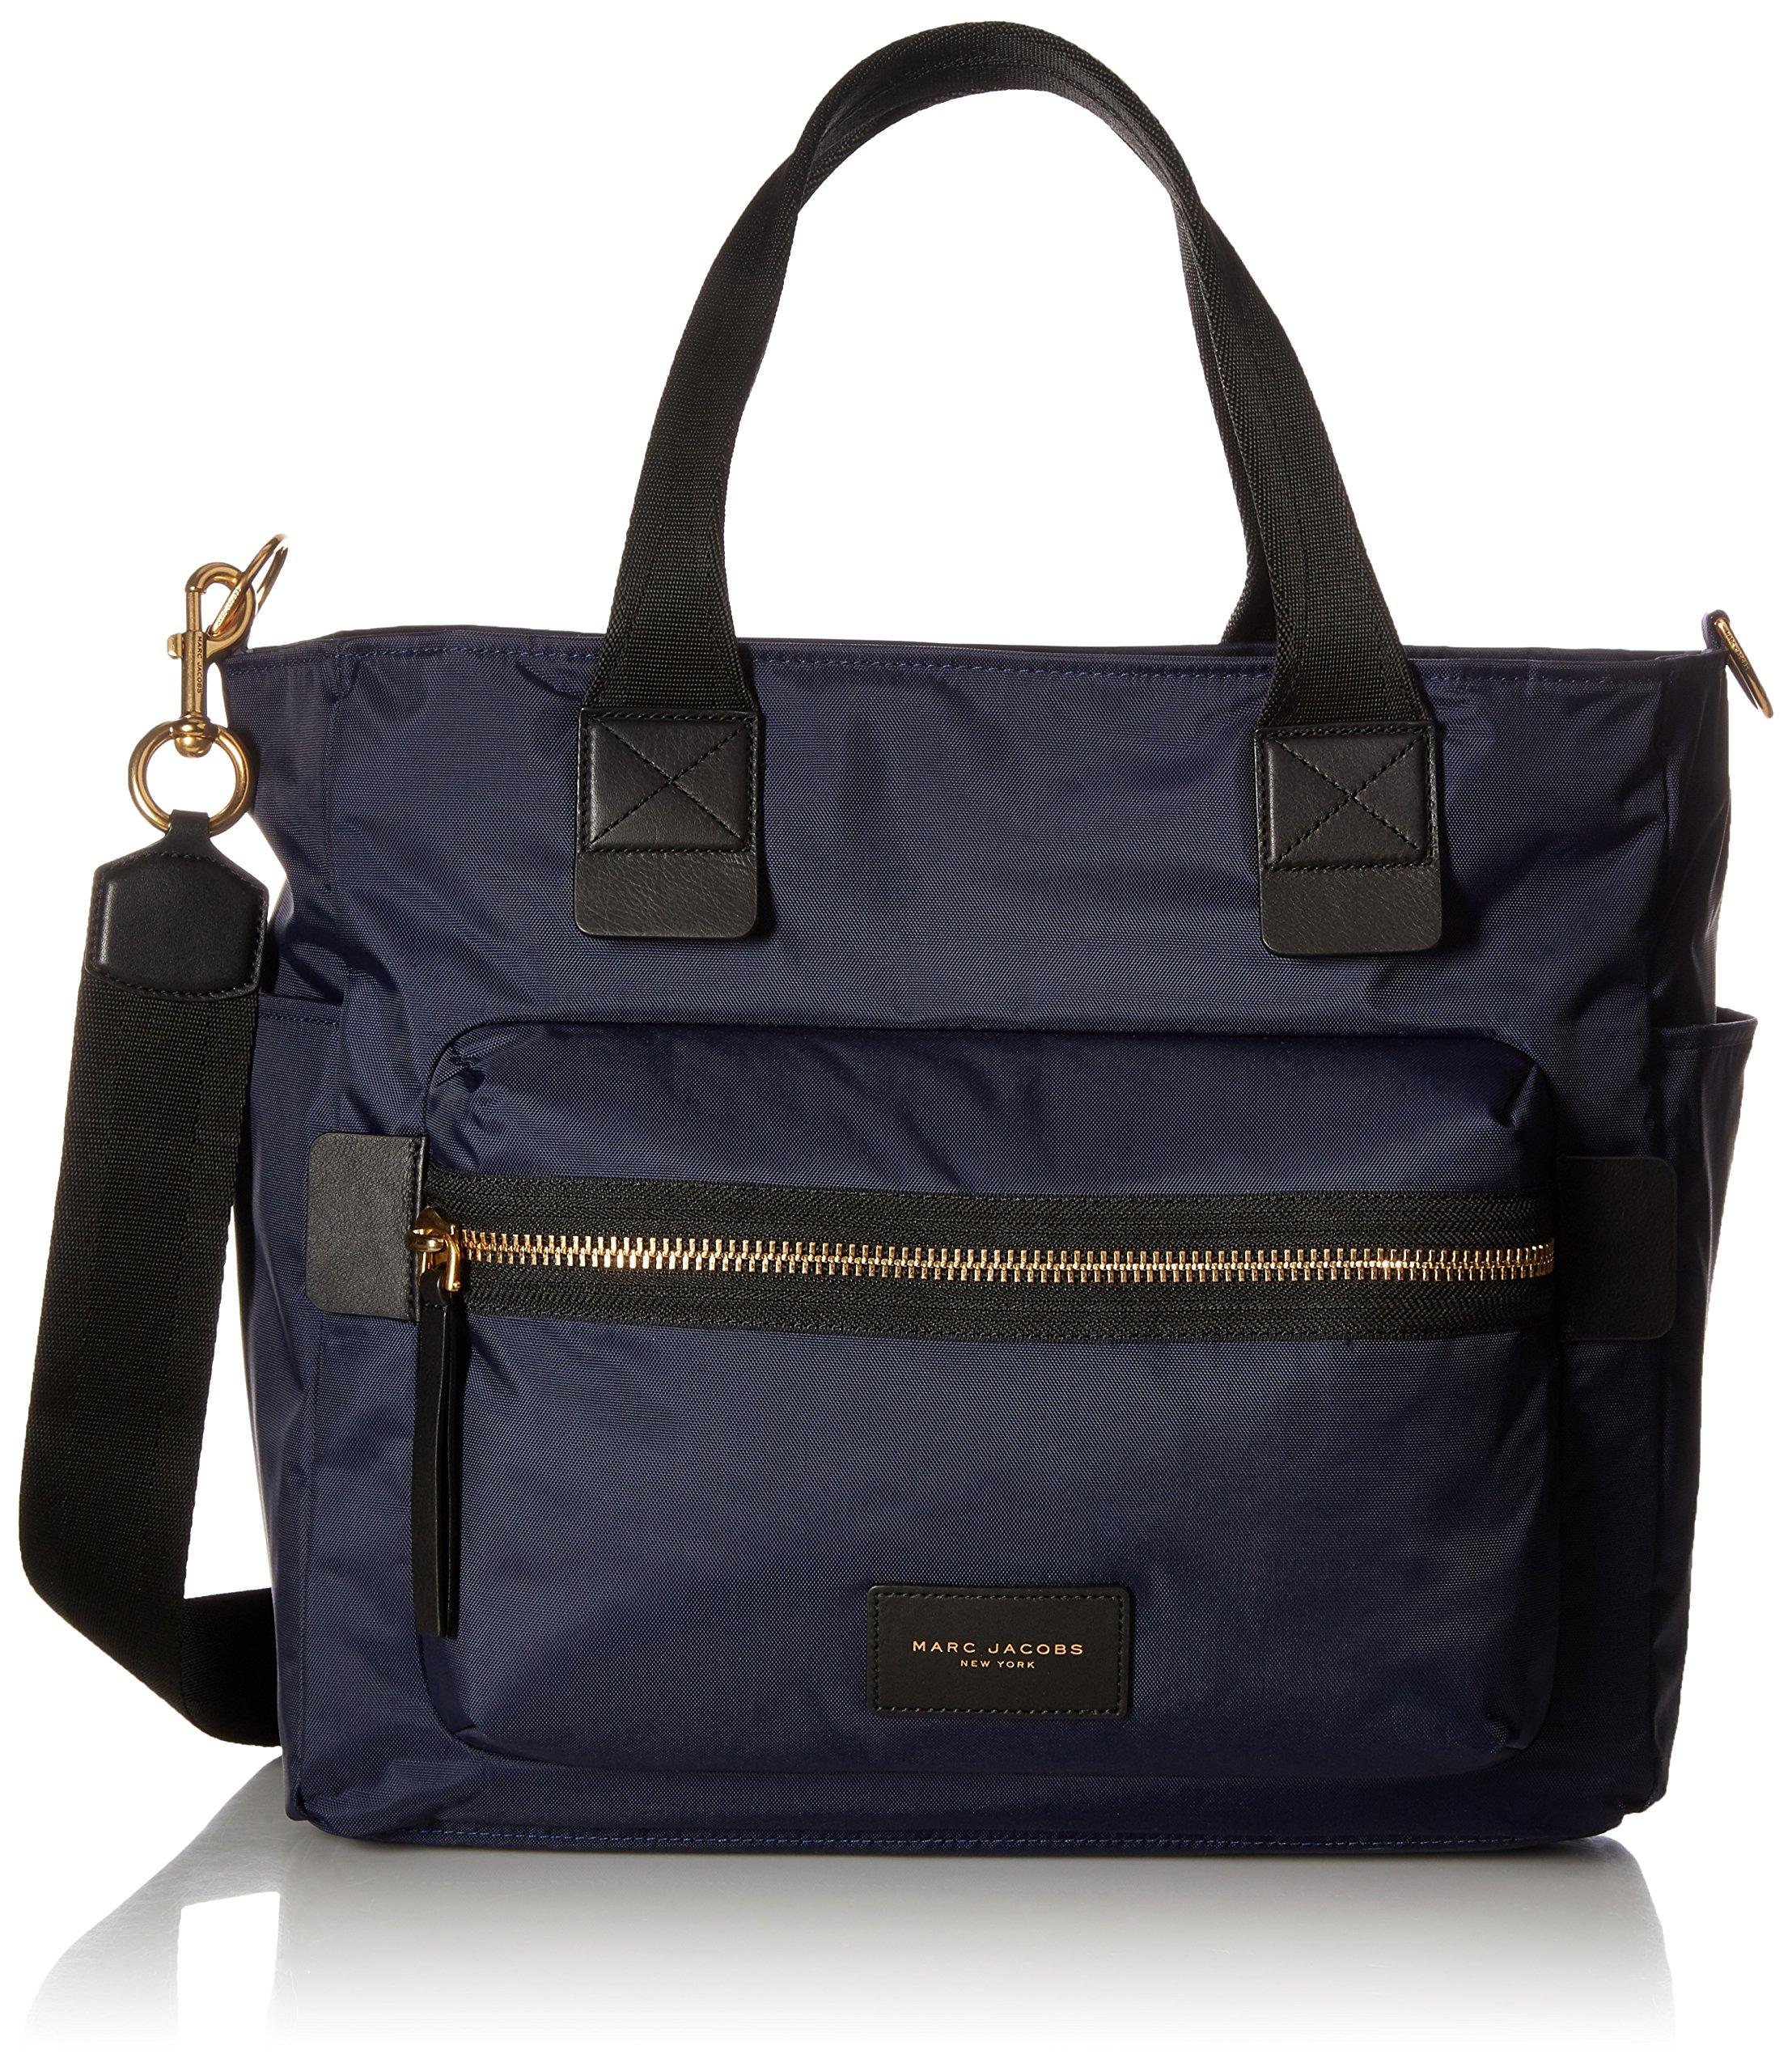 Marc Jacobs Nylon Biker Baby Weekender Bag, Midnight Blue, One Size